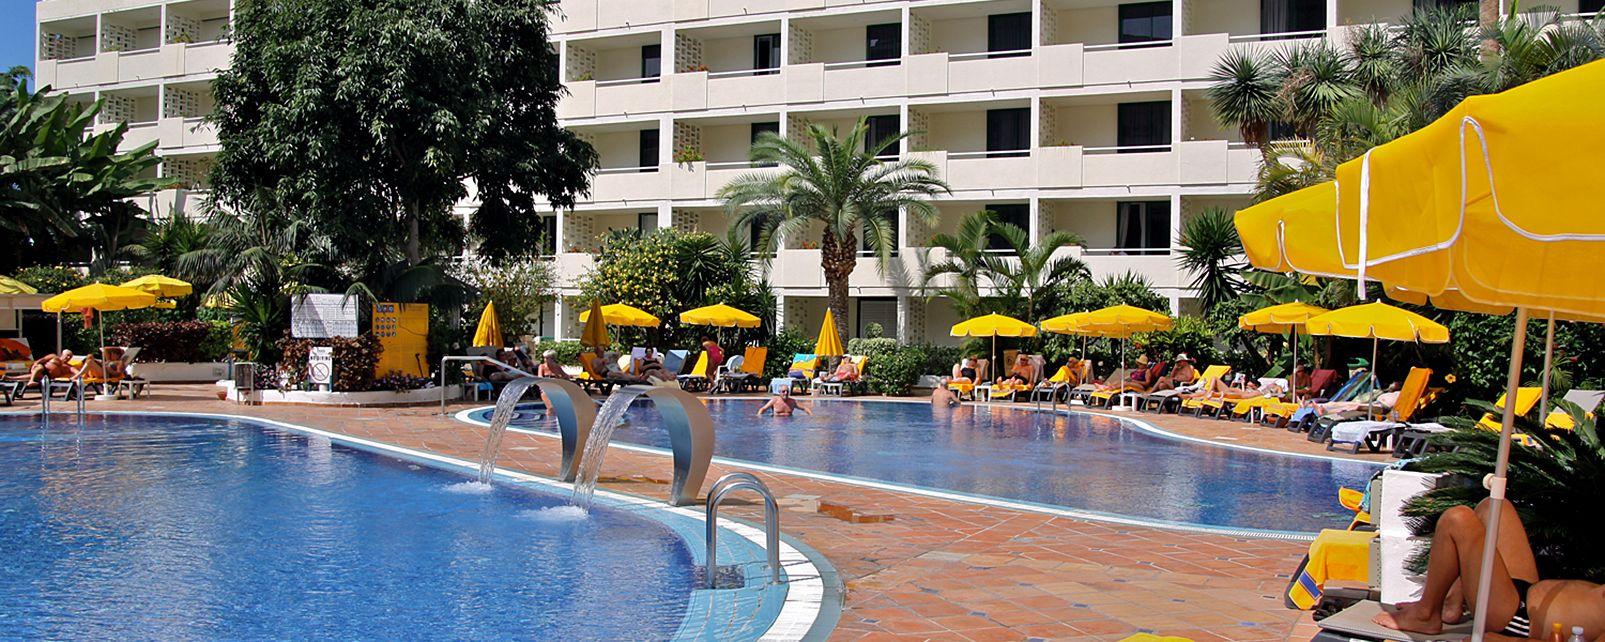 Hôtel H10 Tenerife Playa